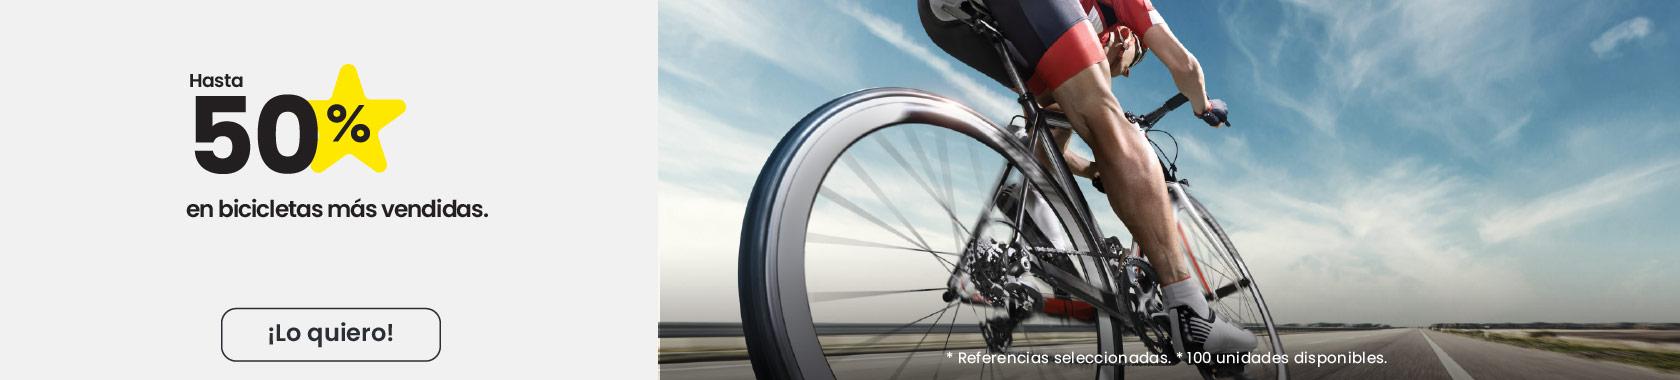 Bicicletas todoterreno